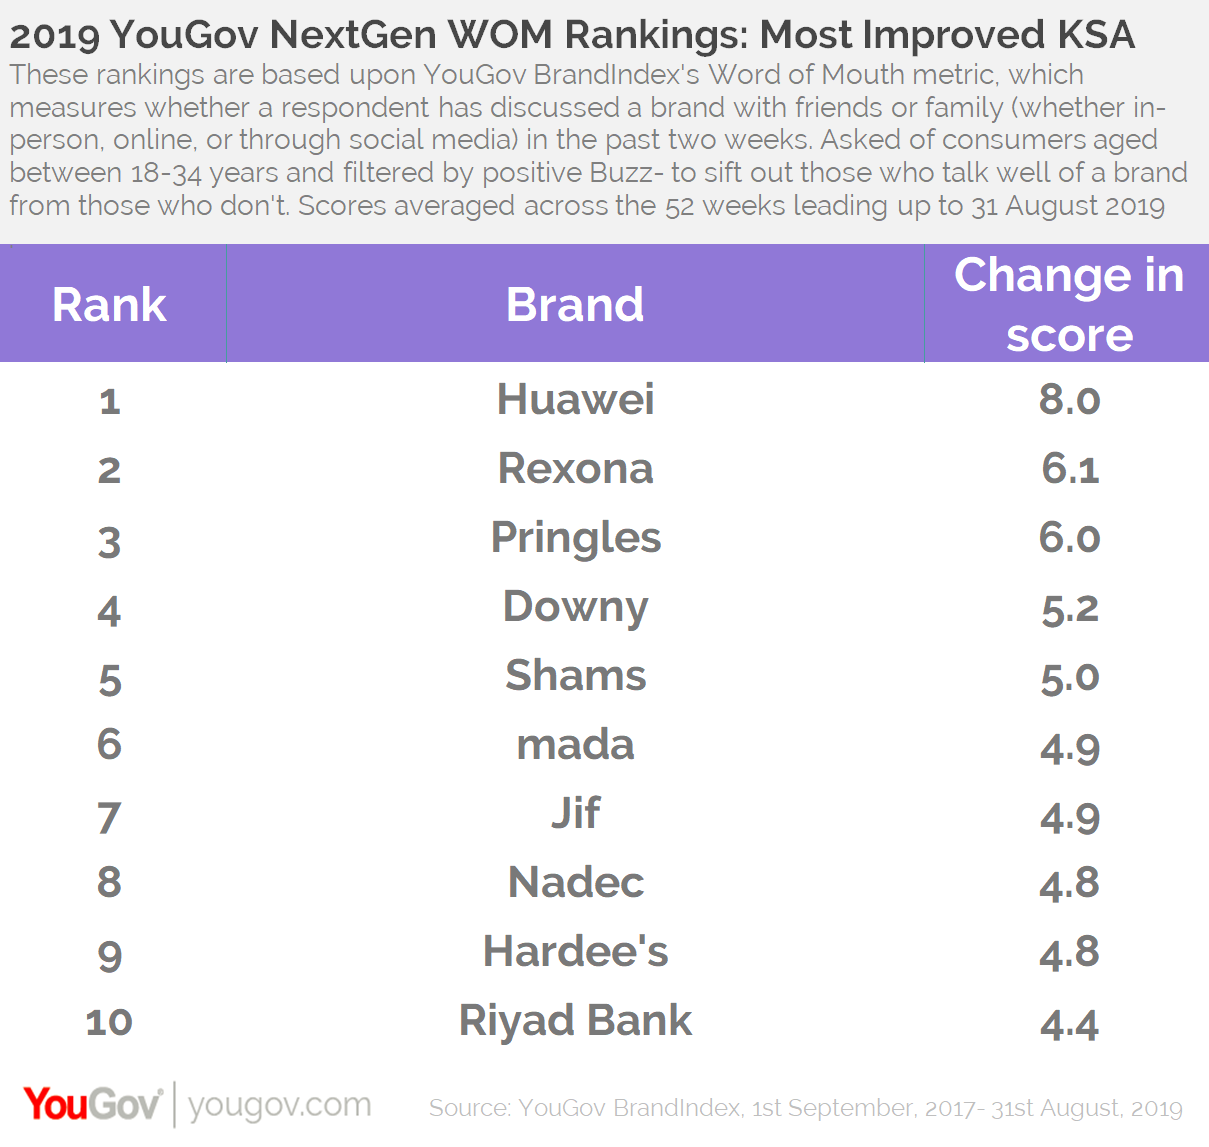 2019 WOM rankings- Top Improvers KSA